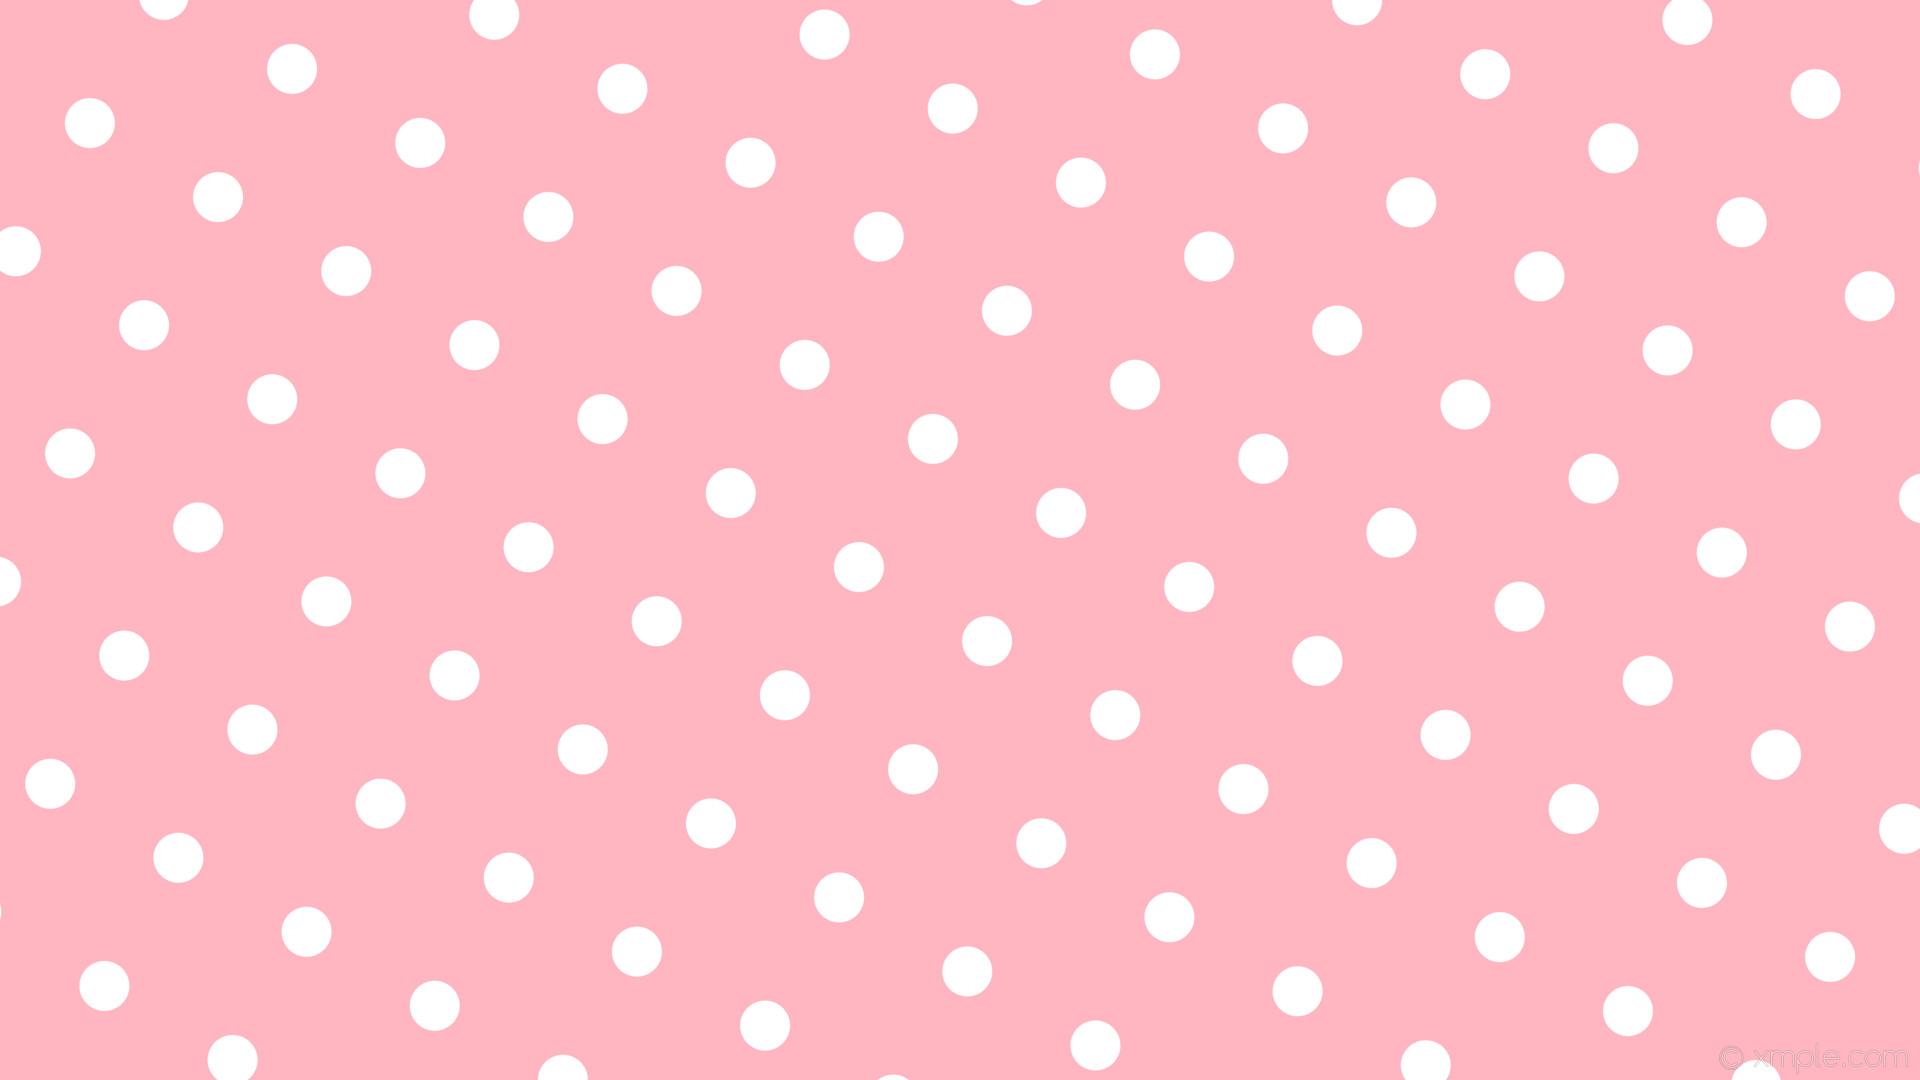 wallpaper pink polka dots spots white light pink #ffb6c1 #ffffff 60° 50px  148px